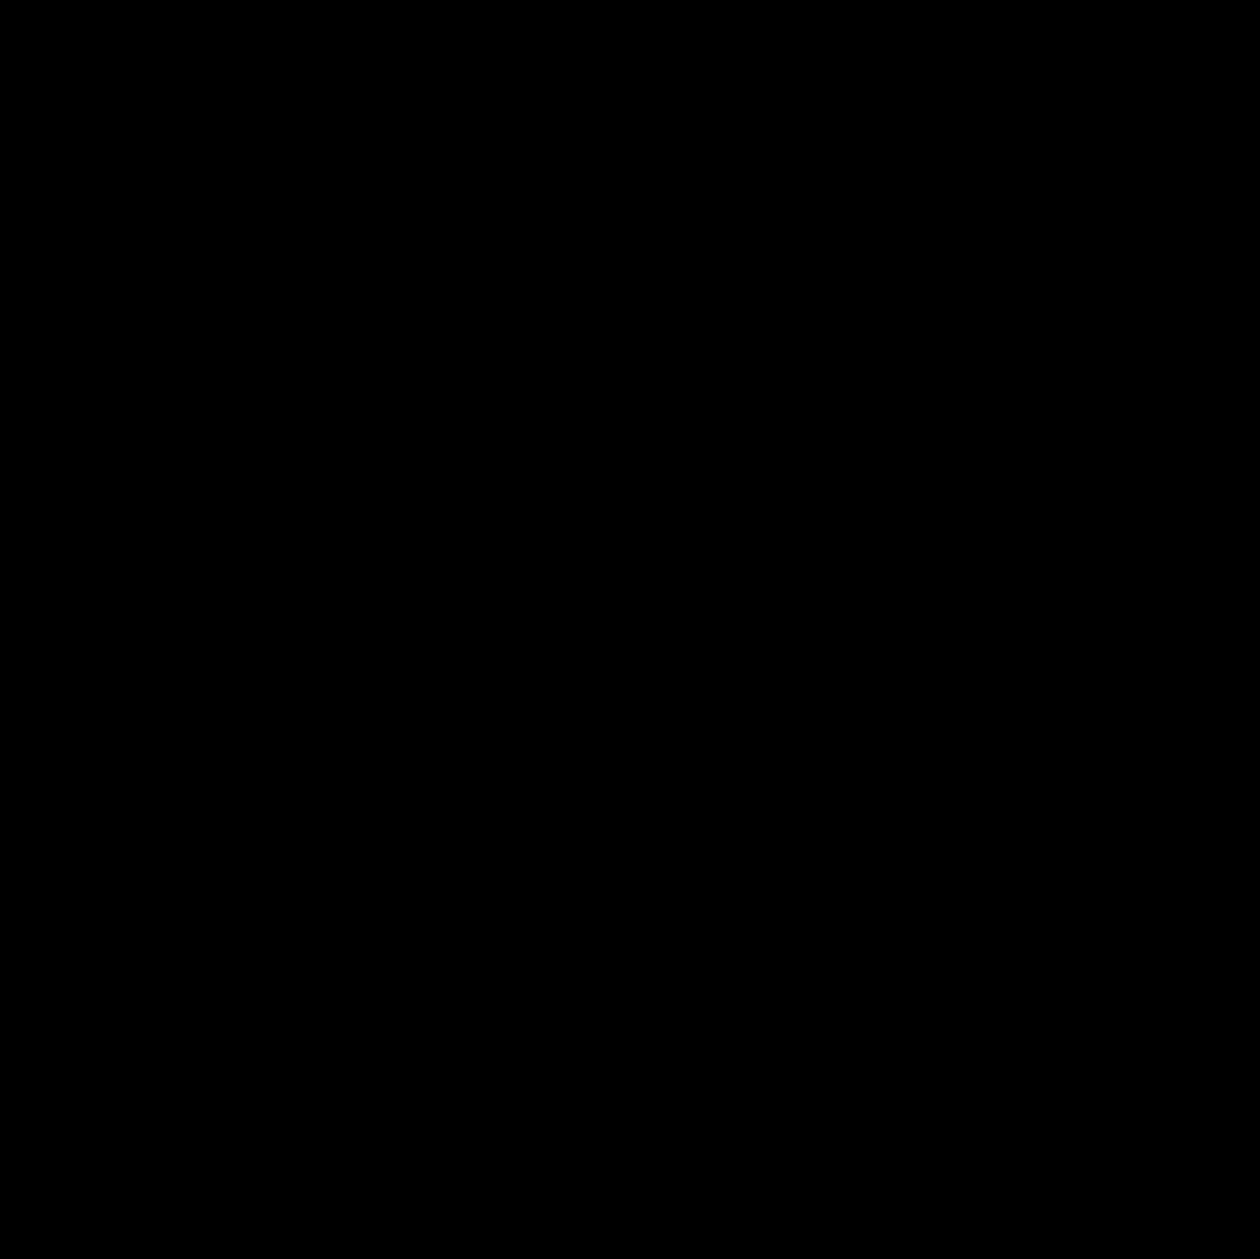 8664 – 06